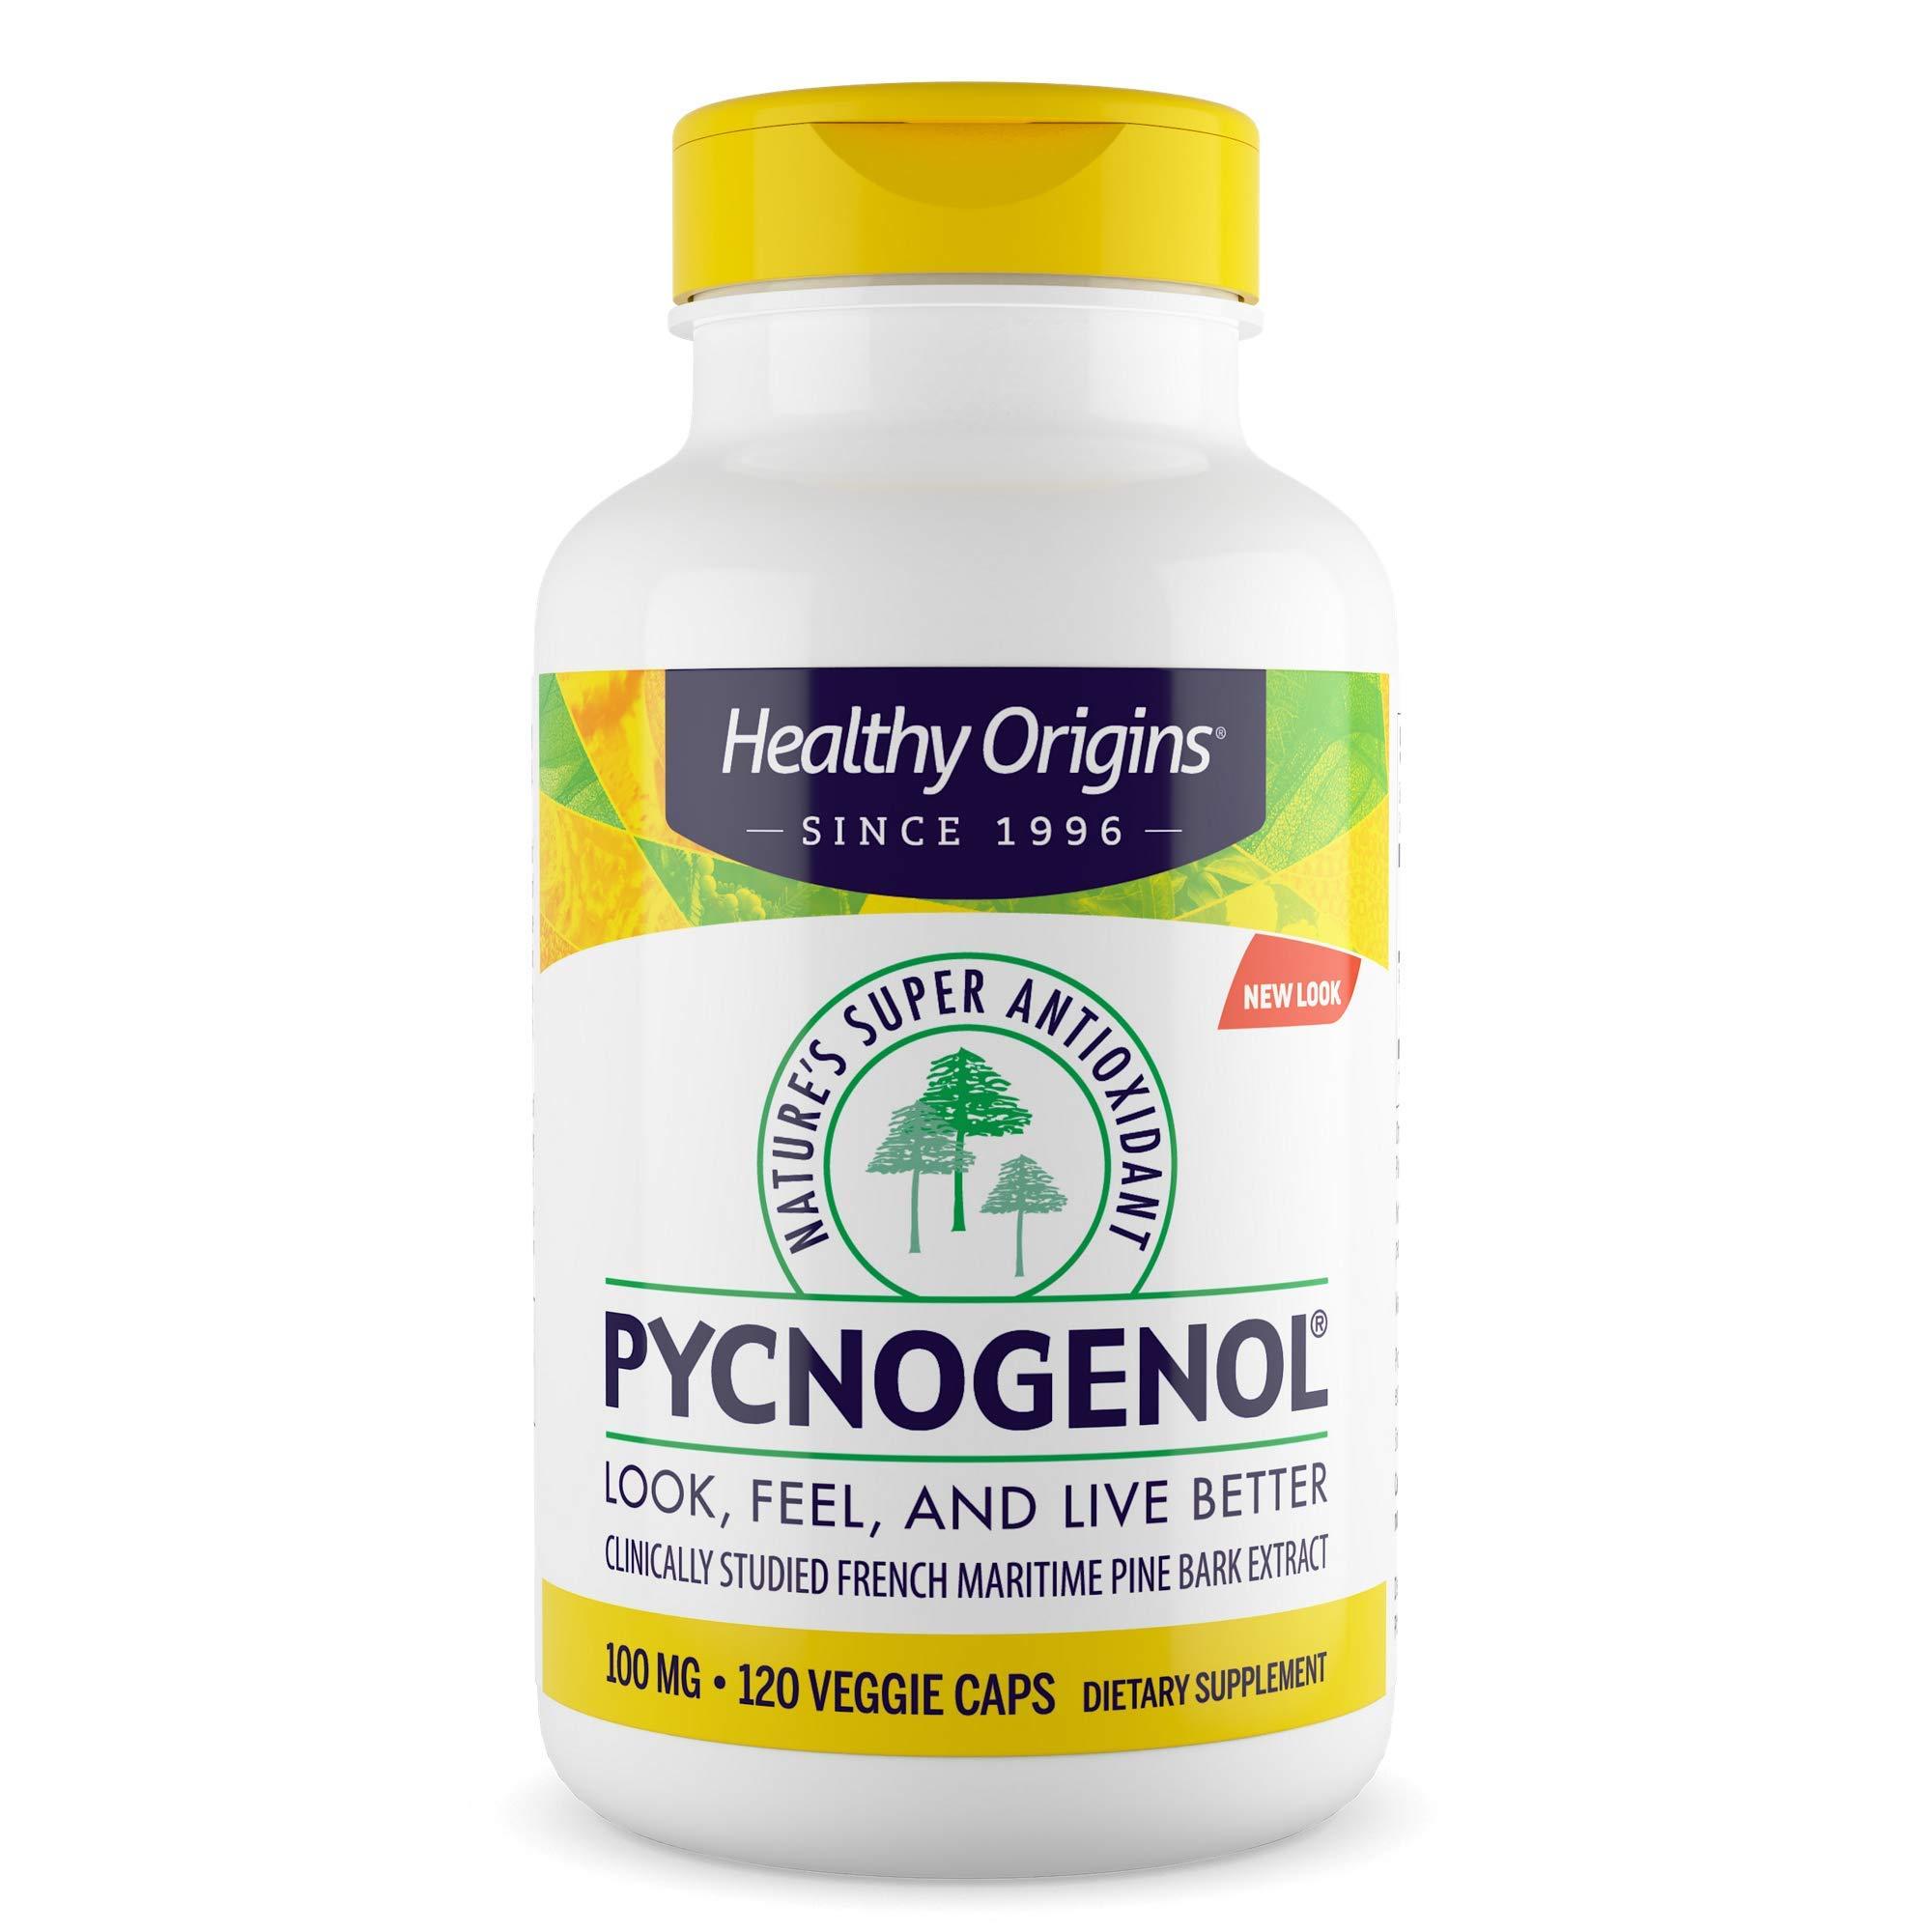 Healthy Origins Pycnogenol (Nature's Super Antioxidant) 100 mg, 120 Count